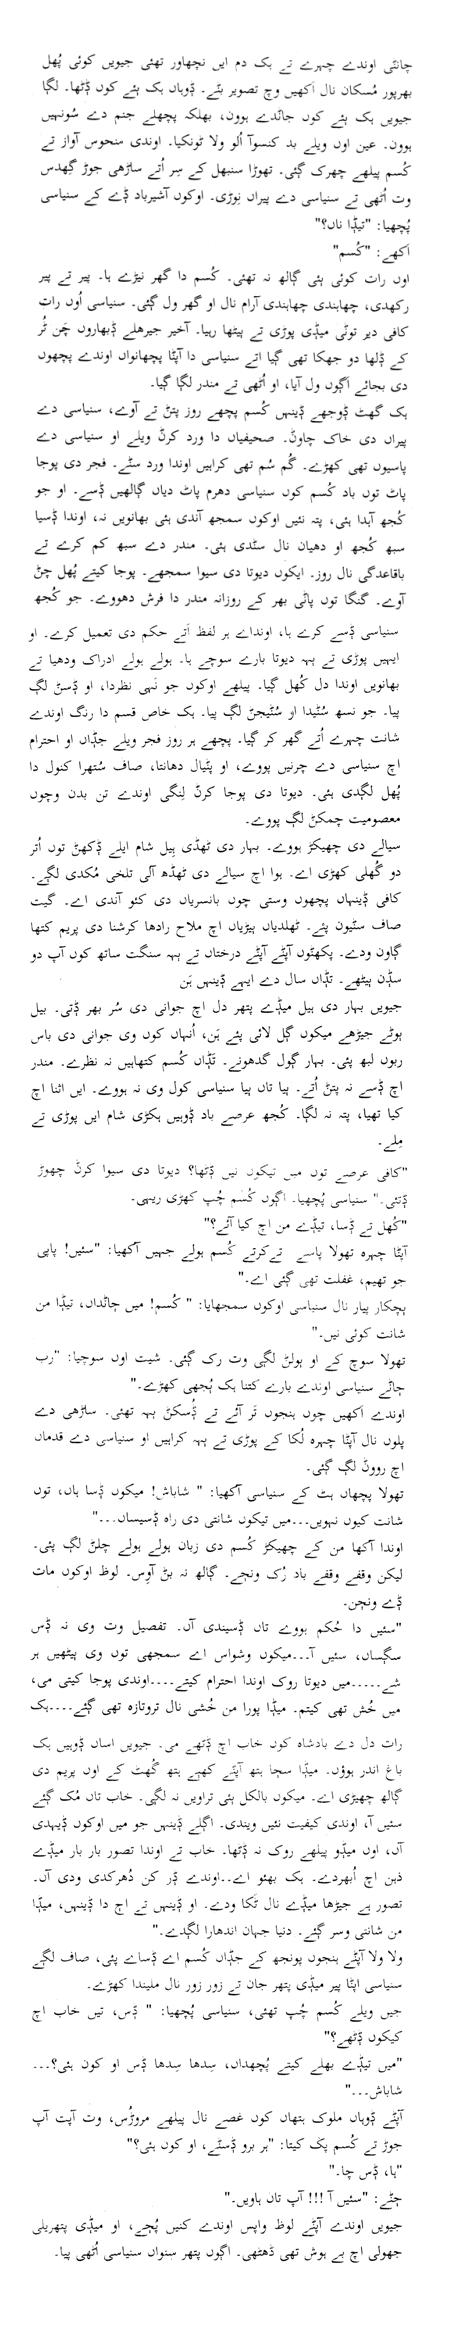 Seraiki Afsana Pattan kitha (Rabindar Nath Tagore translator Mazar Khan) Part-4